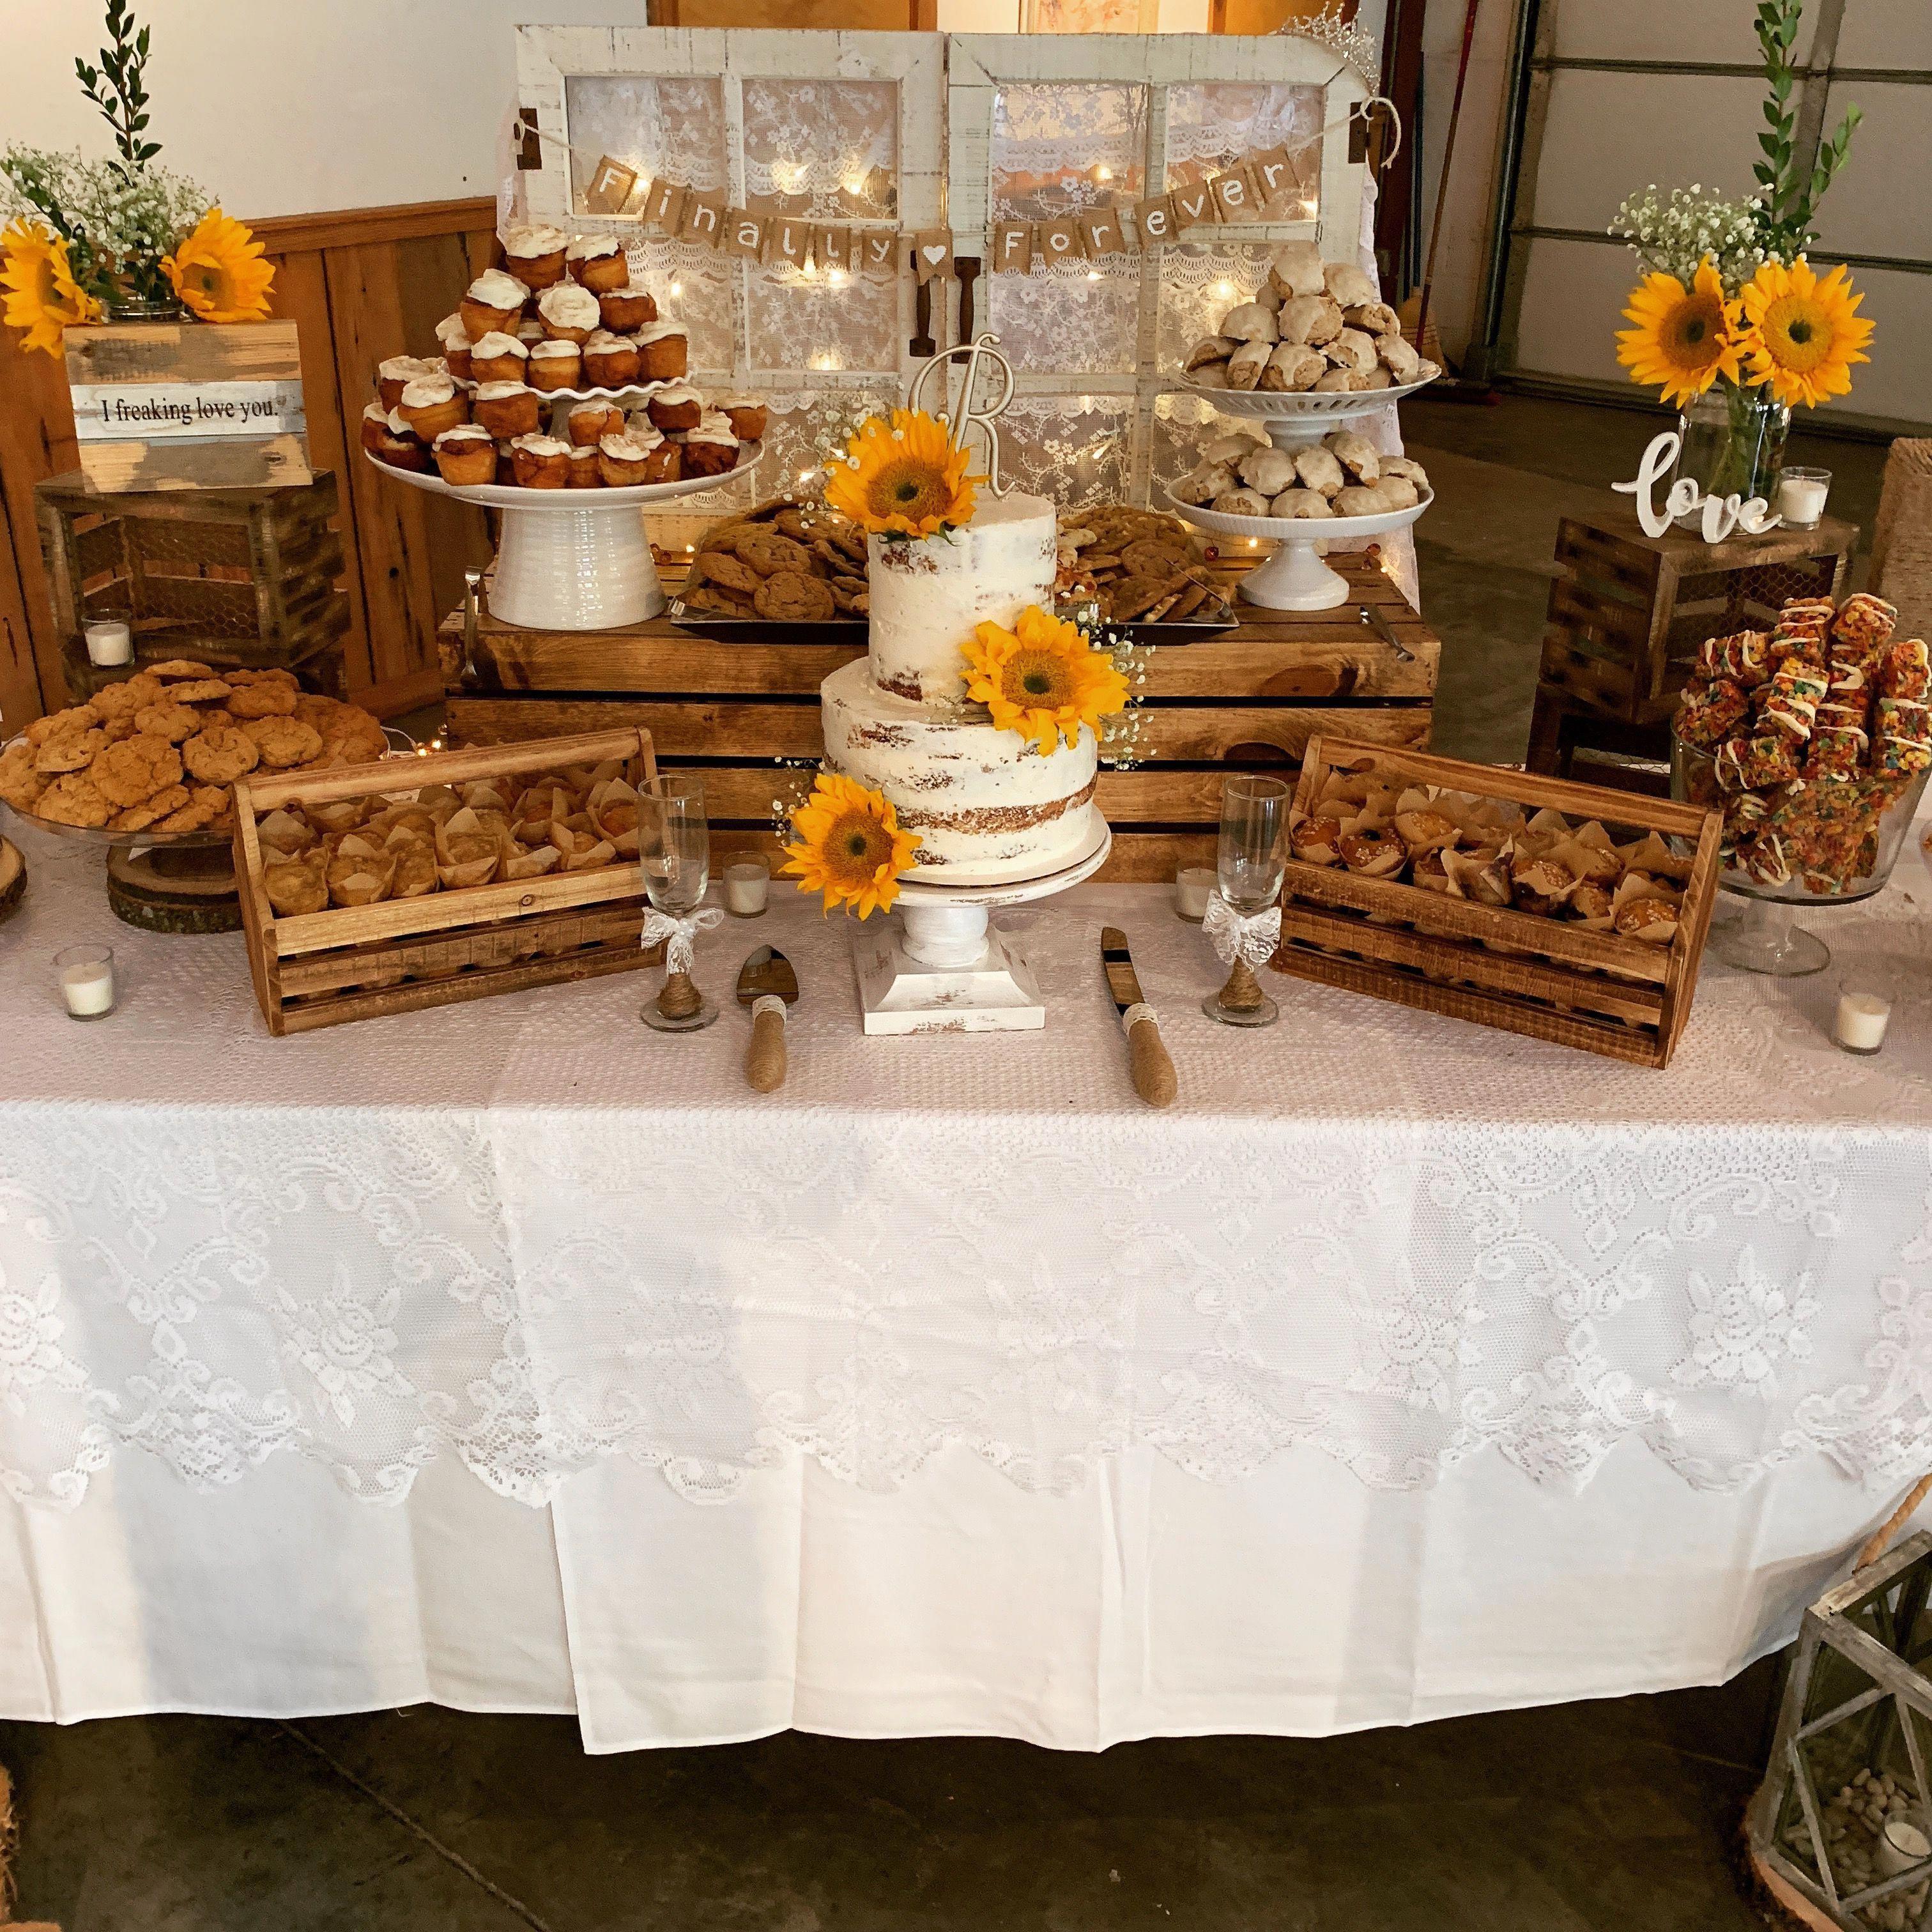 Rustic Wedding Dessert Table Decor With Sunflowers Wedding Dessert Table Rustic Sweets Table Wedding Wedding Dessert Table